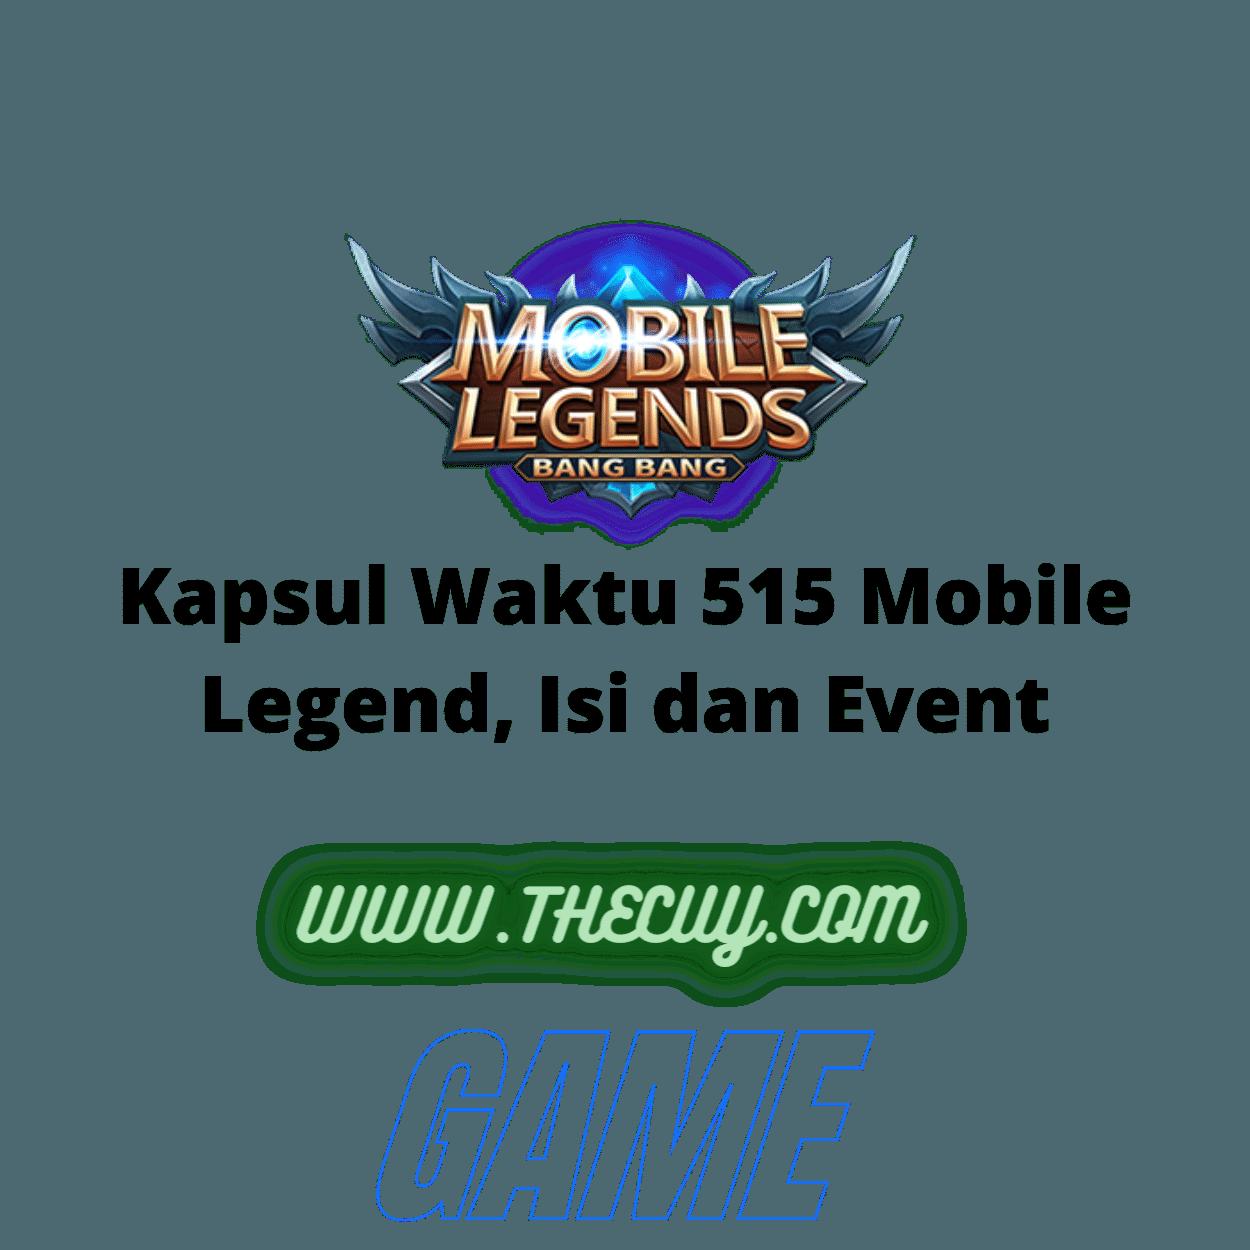 Kapsul Waktu 515 Mobile Legend, Isi dan Event